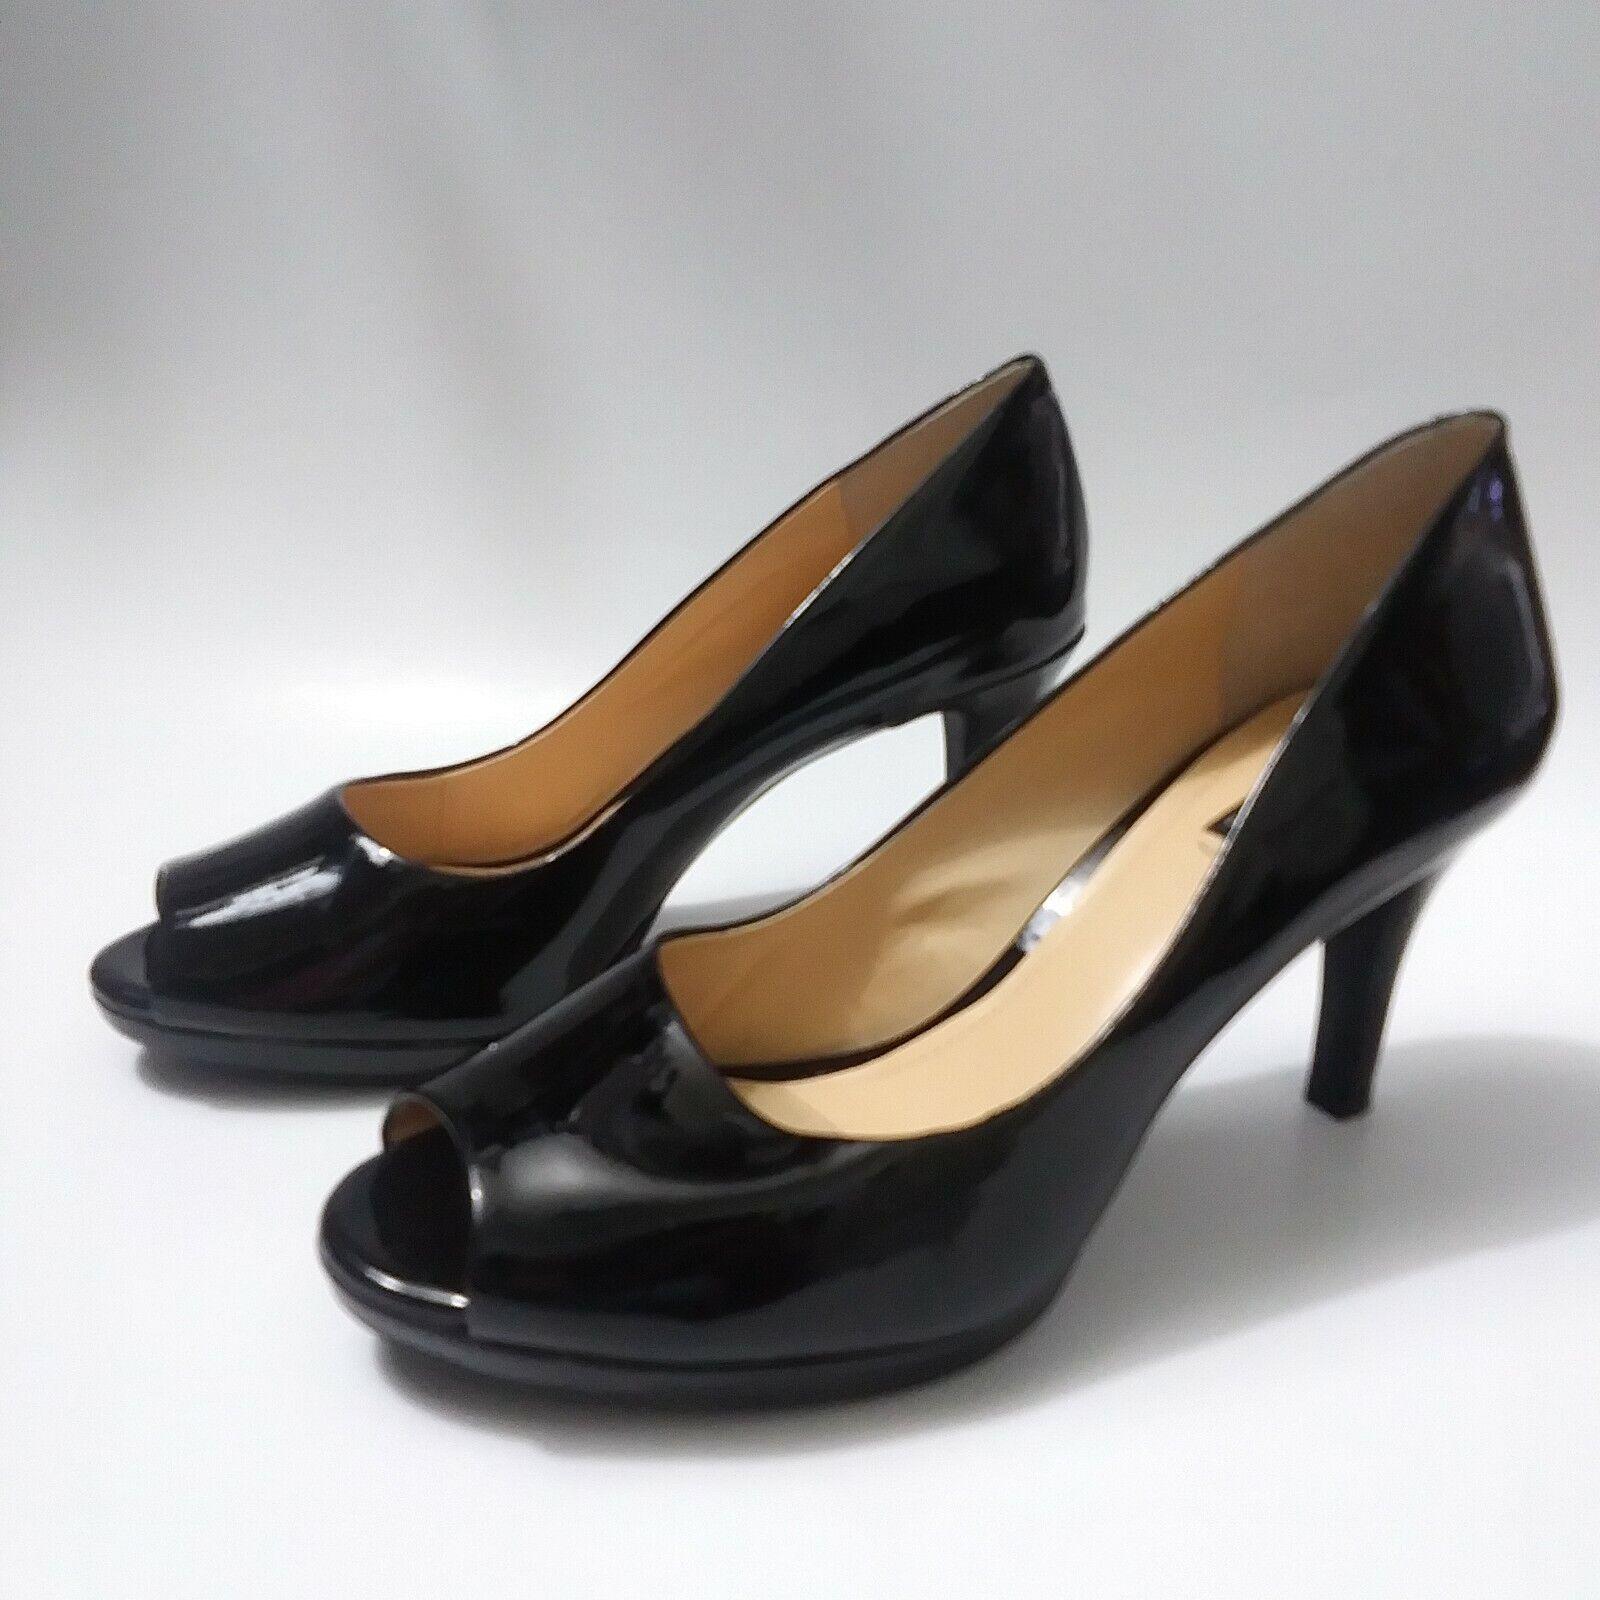 Alex Marie Black Patent Leather Peep Toe Pumps Heels Womens Size 8 M Career Wear